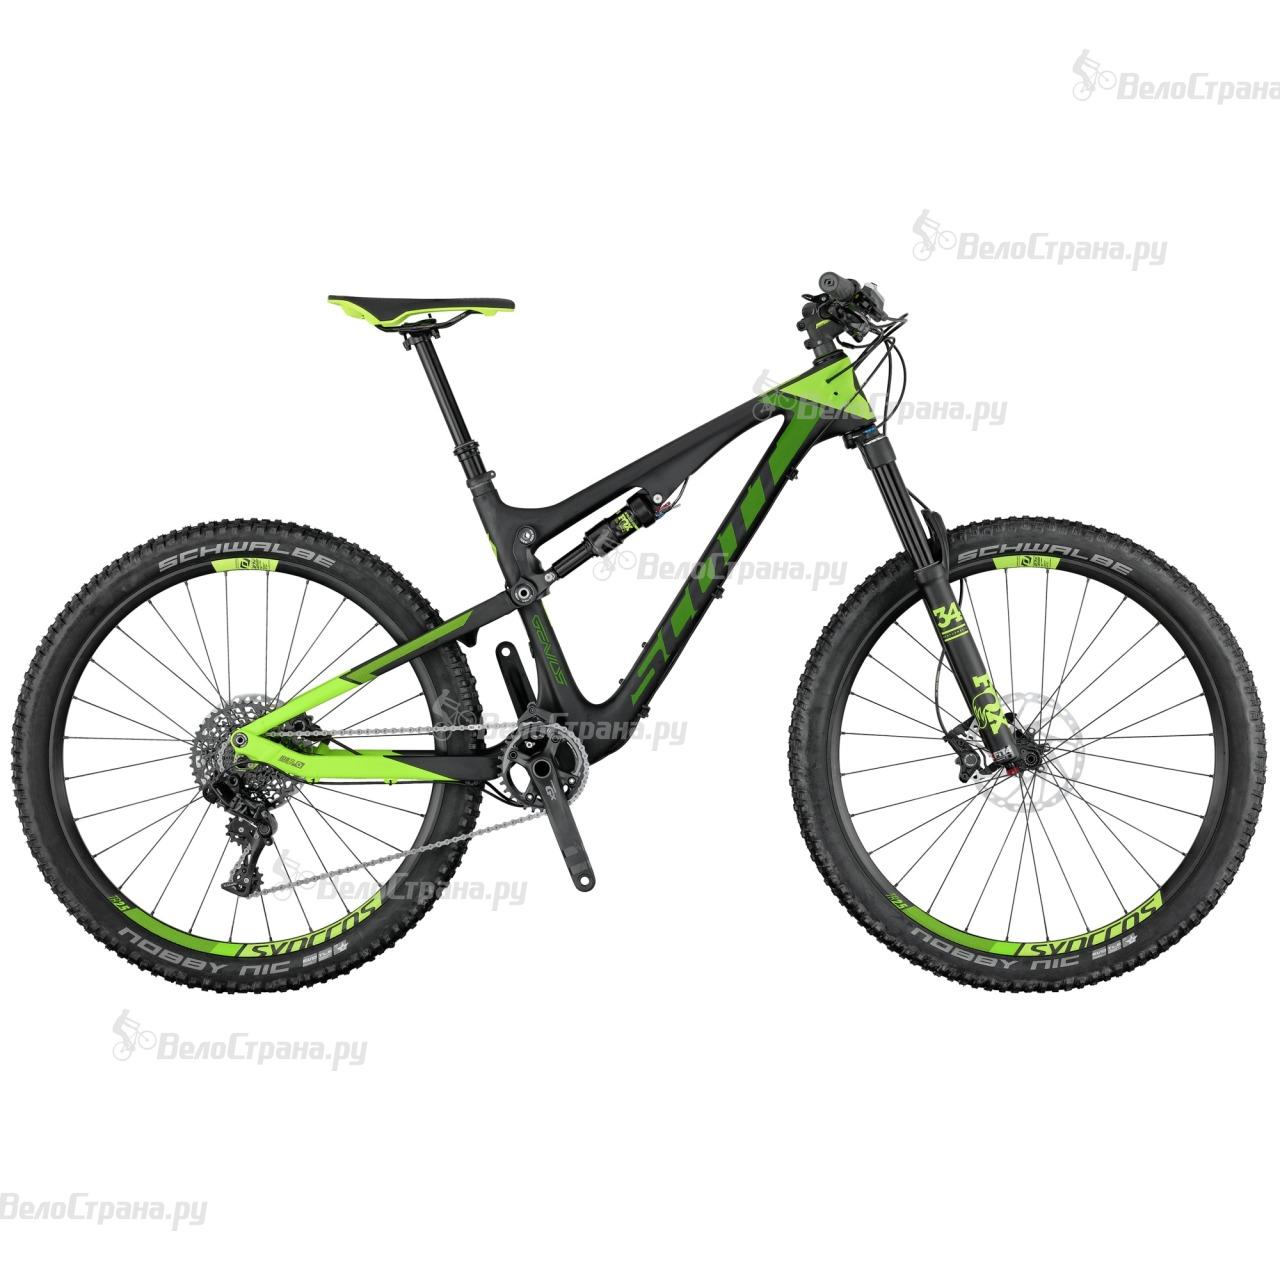 Велосипед Scott Genius 720 (2017) велосипед scott genius 720 2015